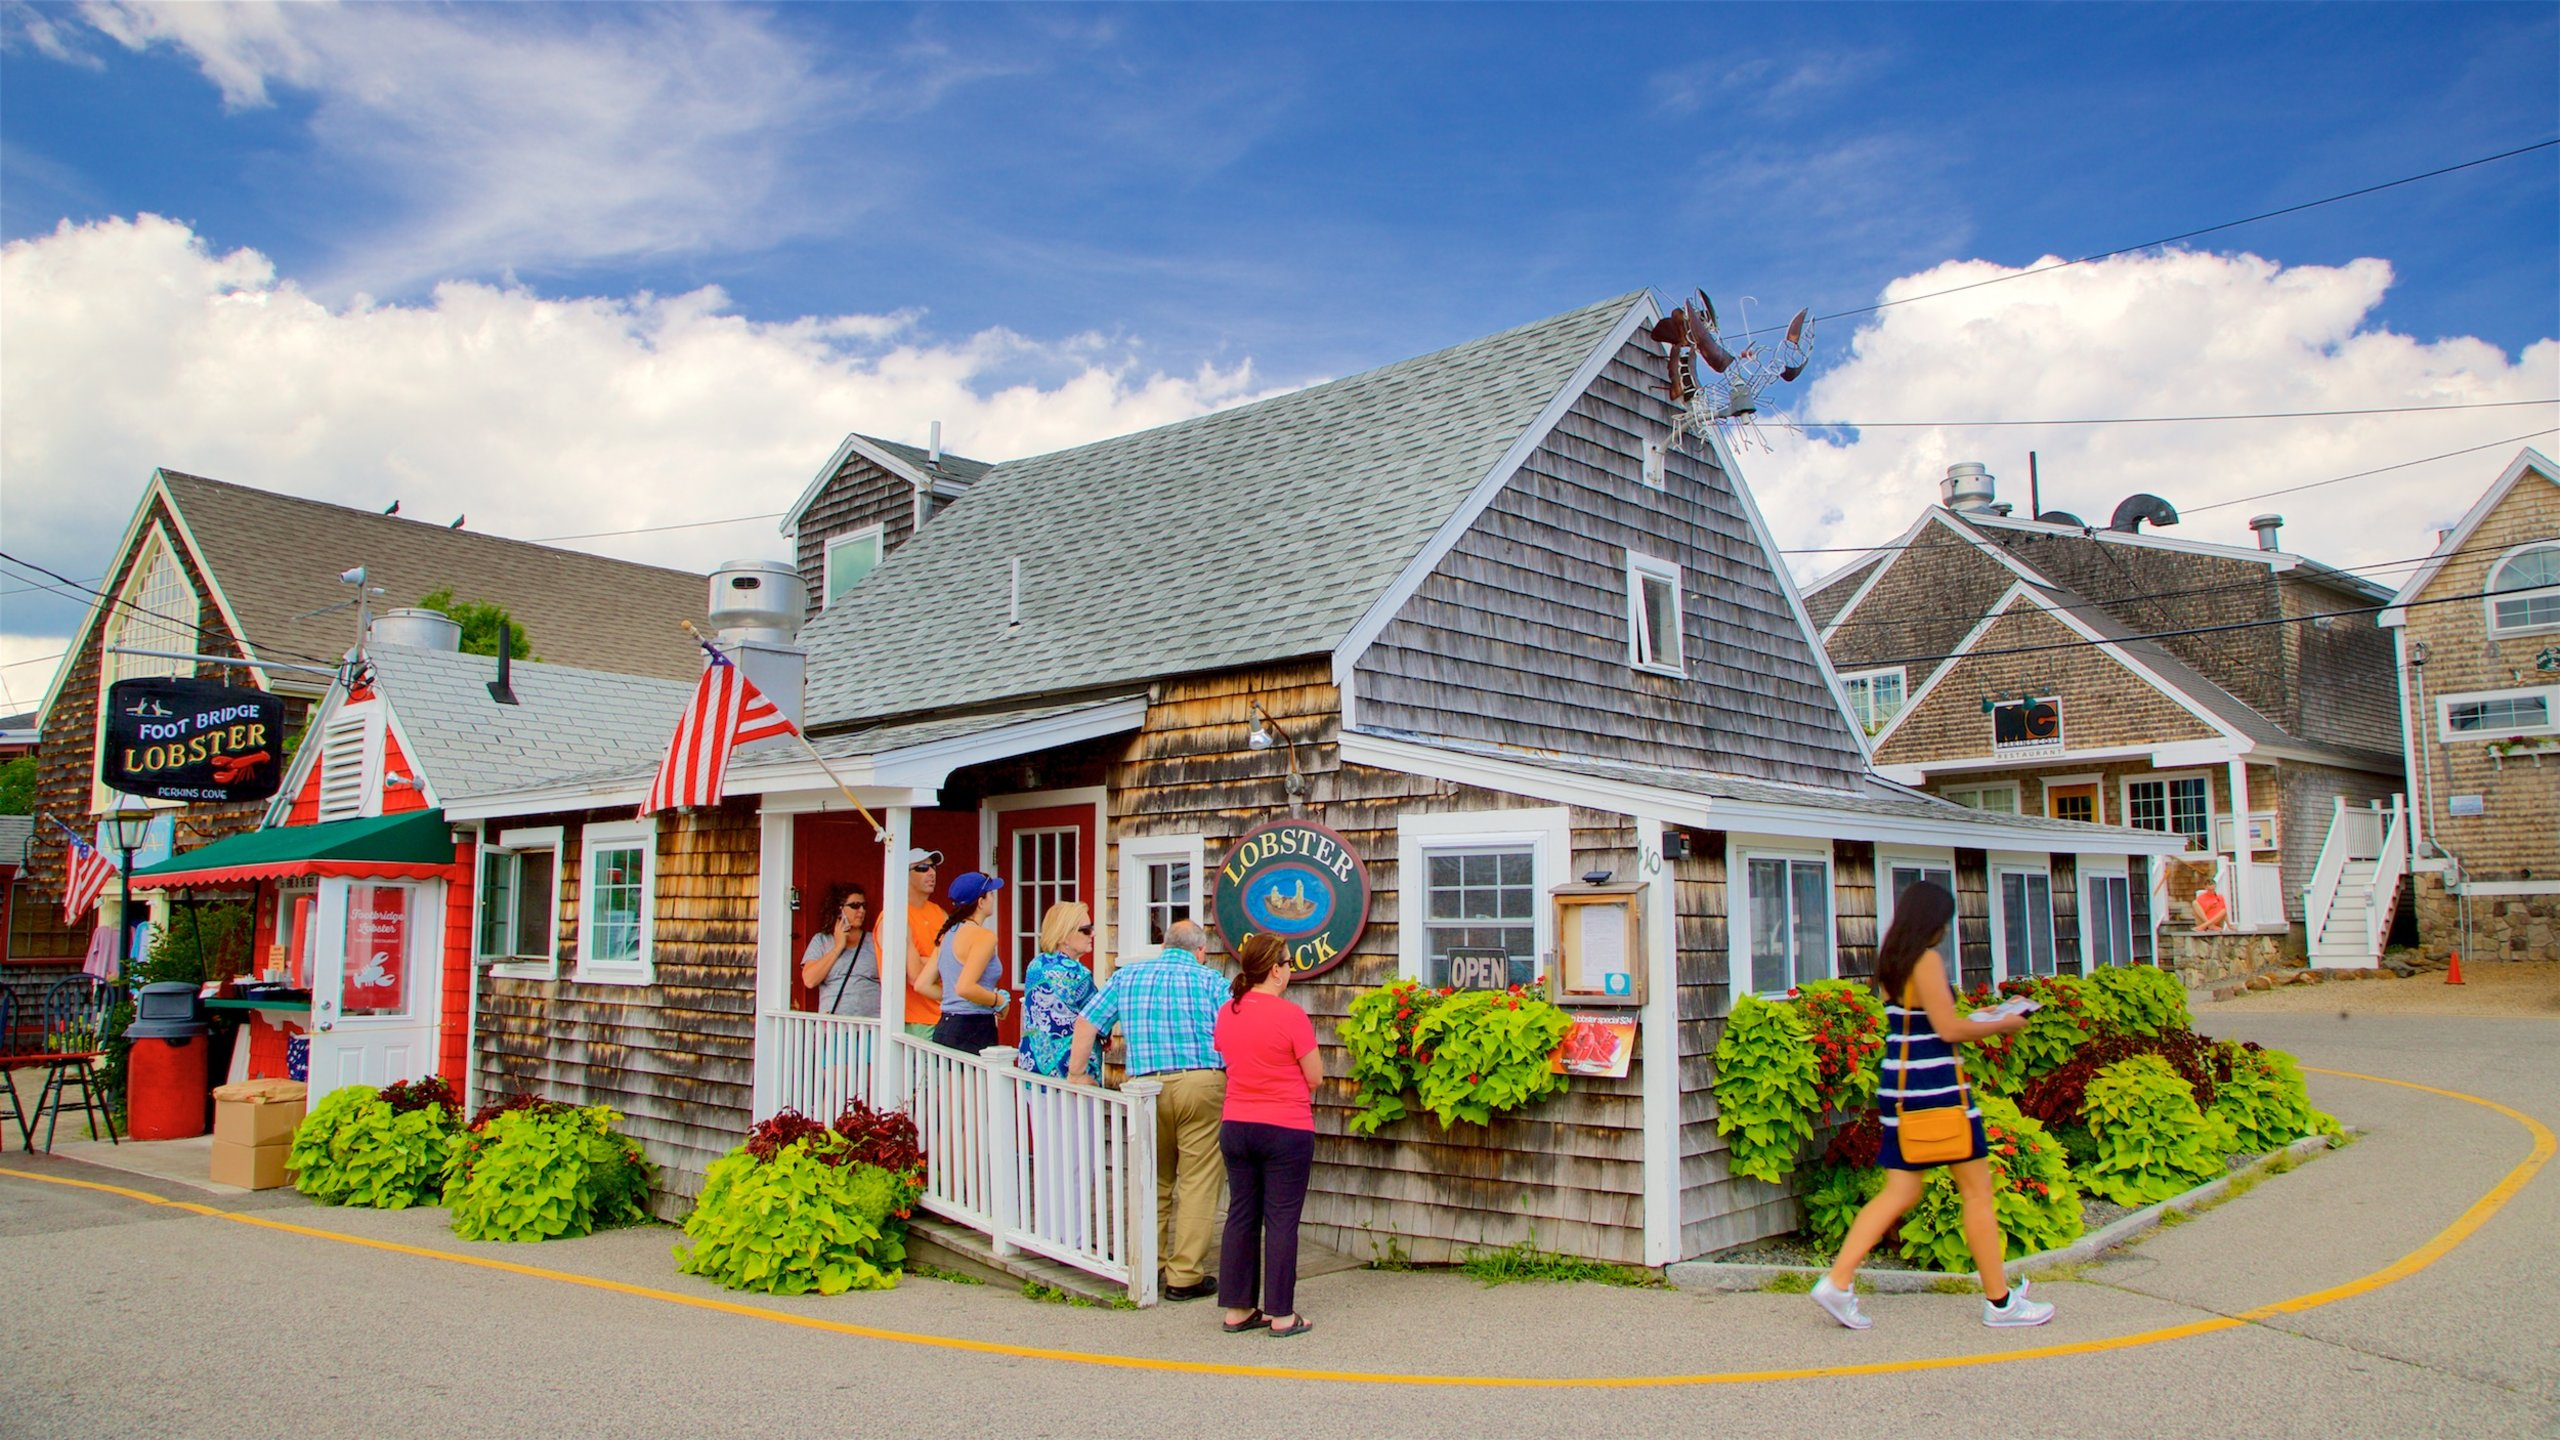 Perkins Cove, Ogunquit, Maine, United States of America